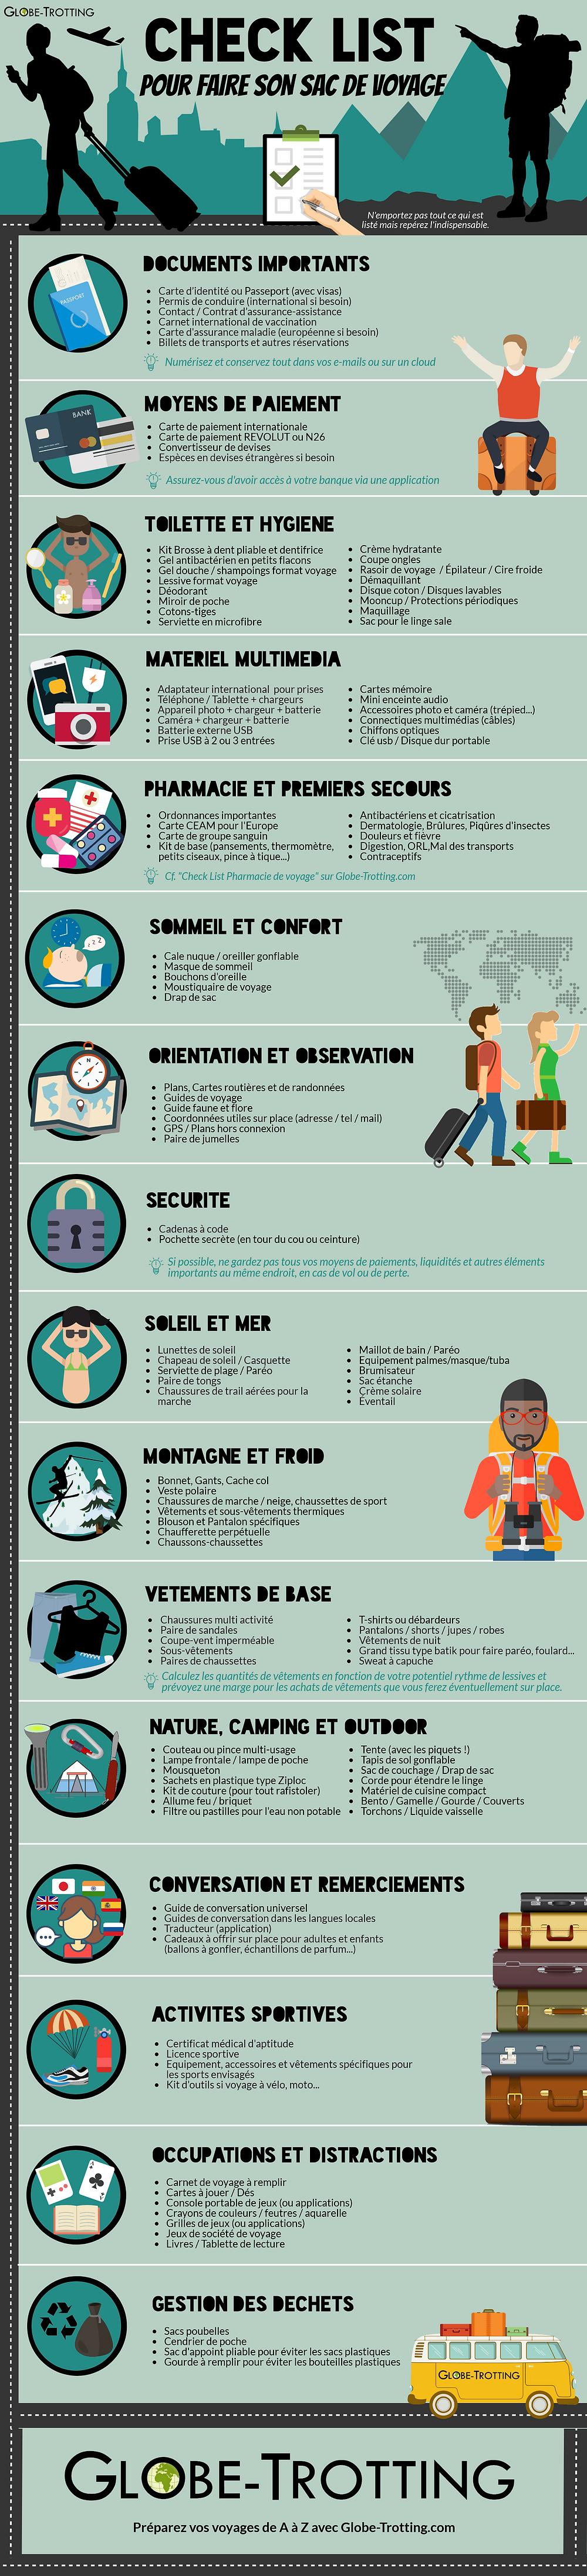 infographie Check list valise vacances